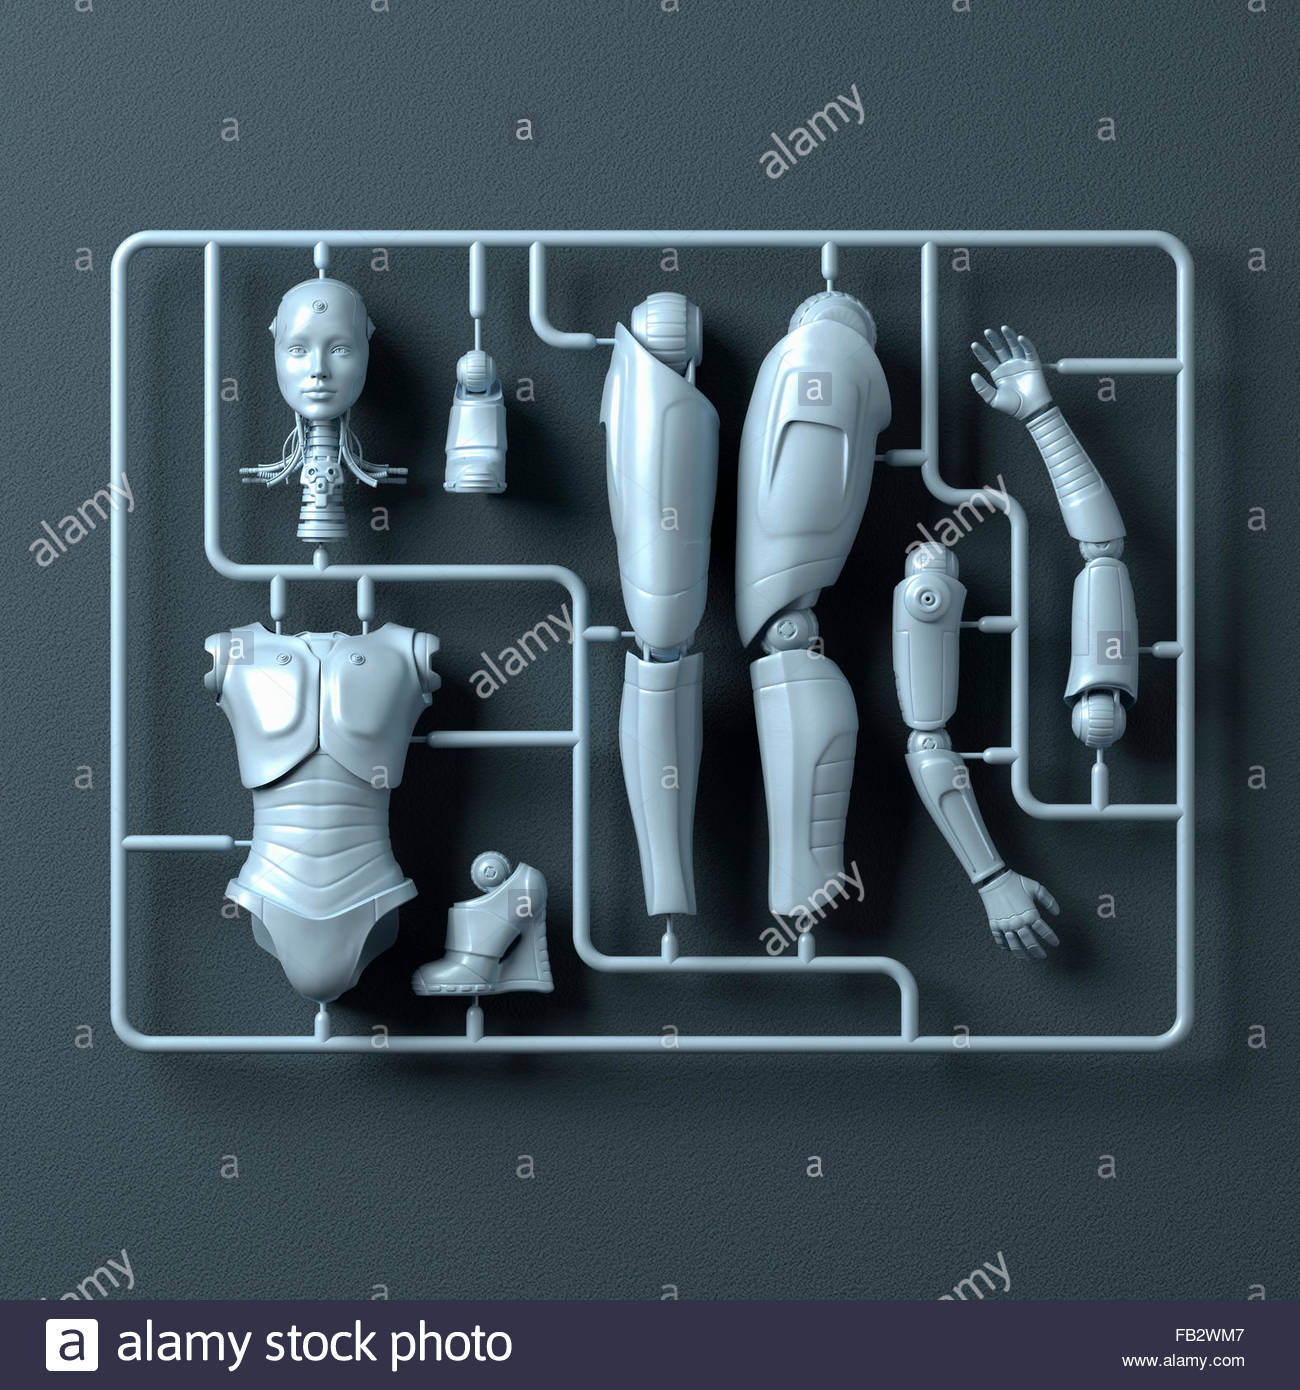 Kit de montaje de plástico para androide femenino Imagen De Stock